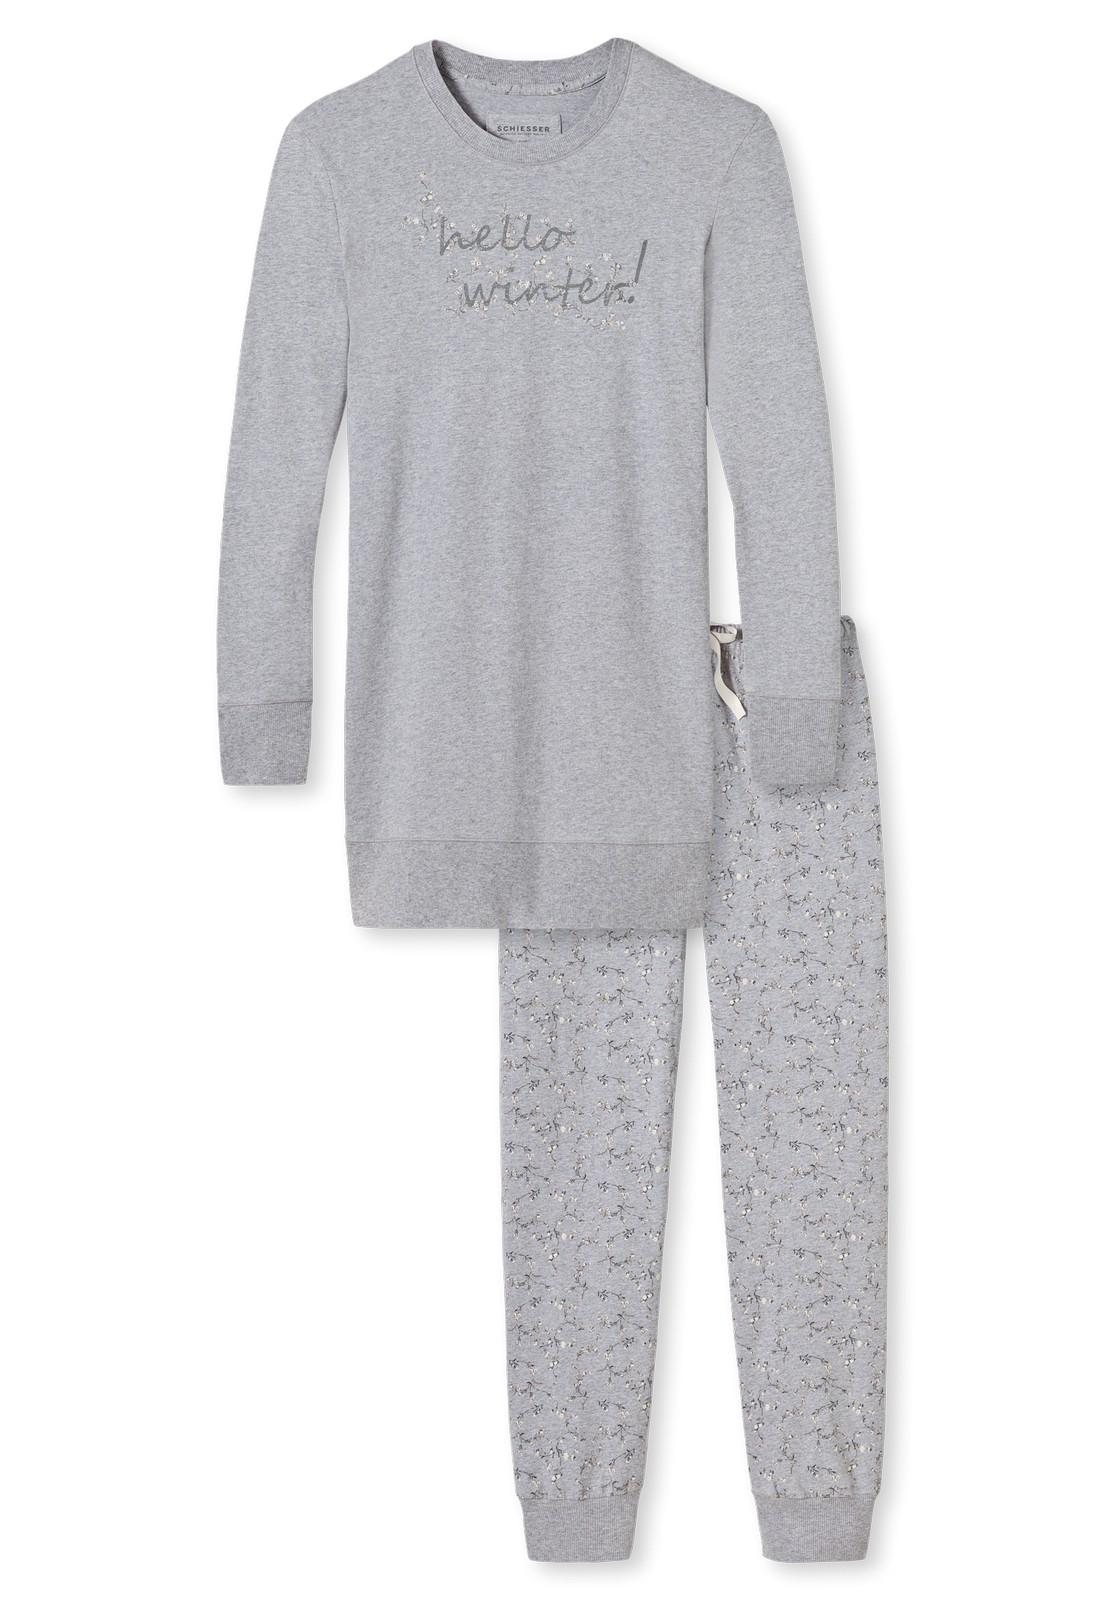 new product a1657 3d050 Schiesser Damen langer Schlafanzug Pyjama Lang Treasure - 149720   KAPS -  Wäsche & mehr - Schiesser - Marc O'Polo - Seidensticker - Lacoste